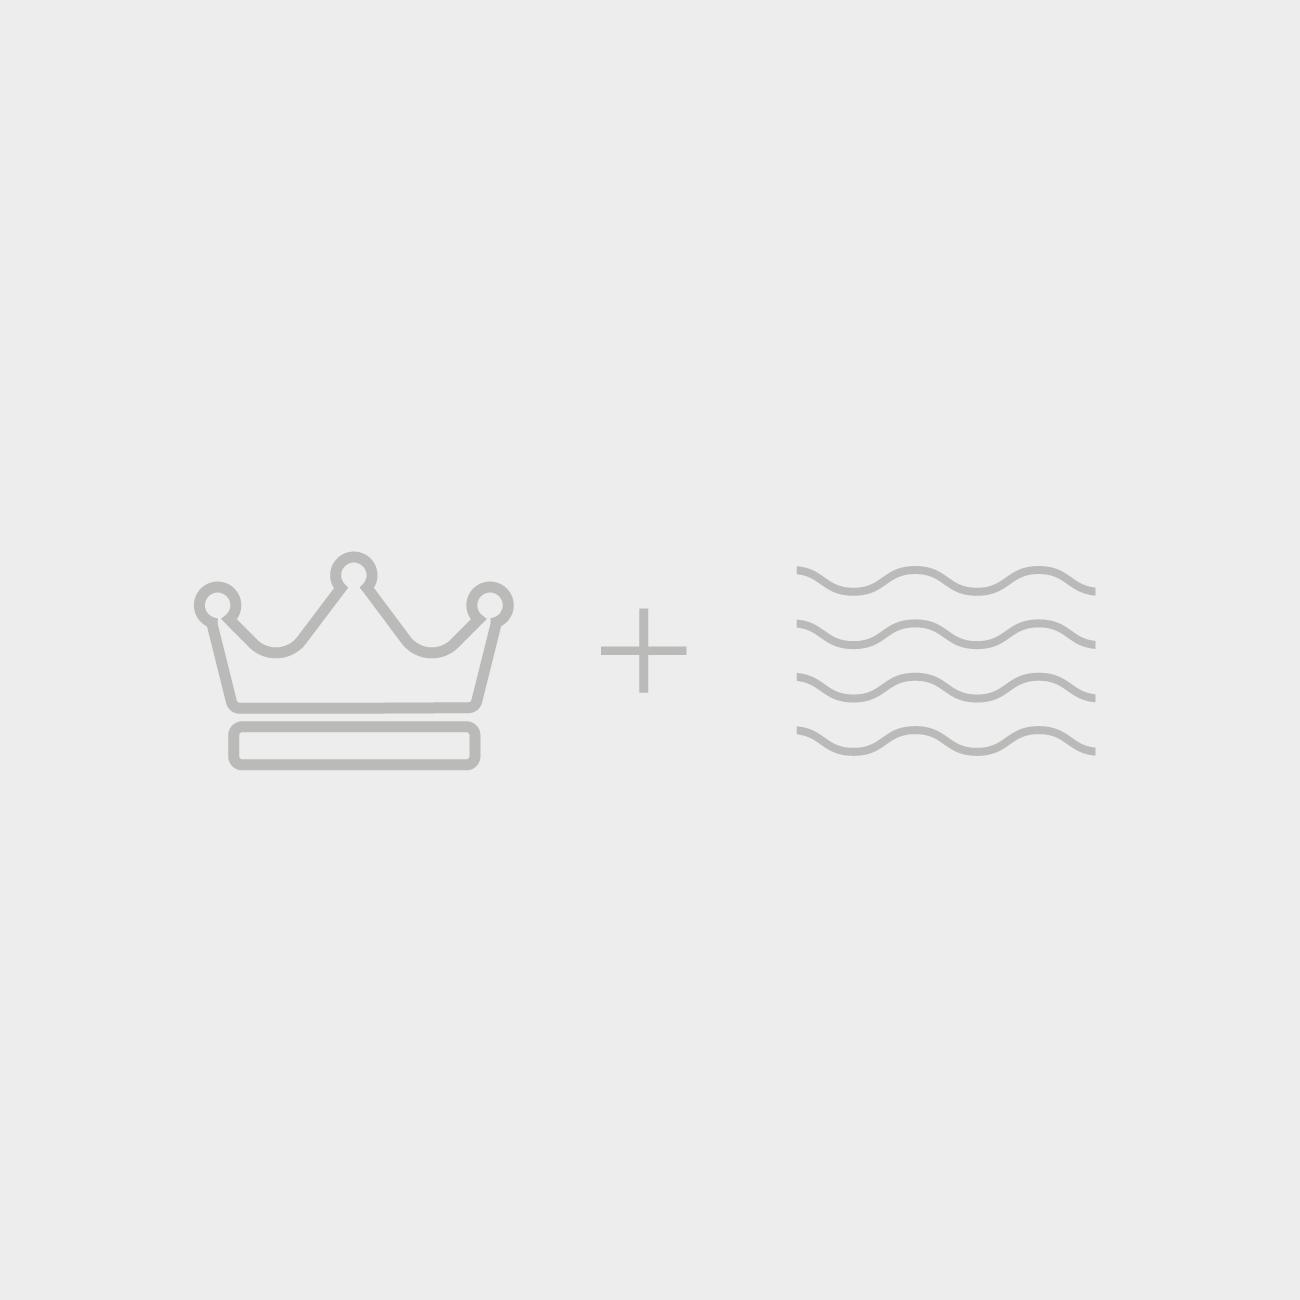 https://www.orlandinifrancesco.com/wp/wp-content/uploads/2019/02/Salento-Deluxe-Logo1.png